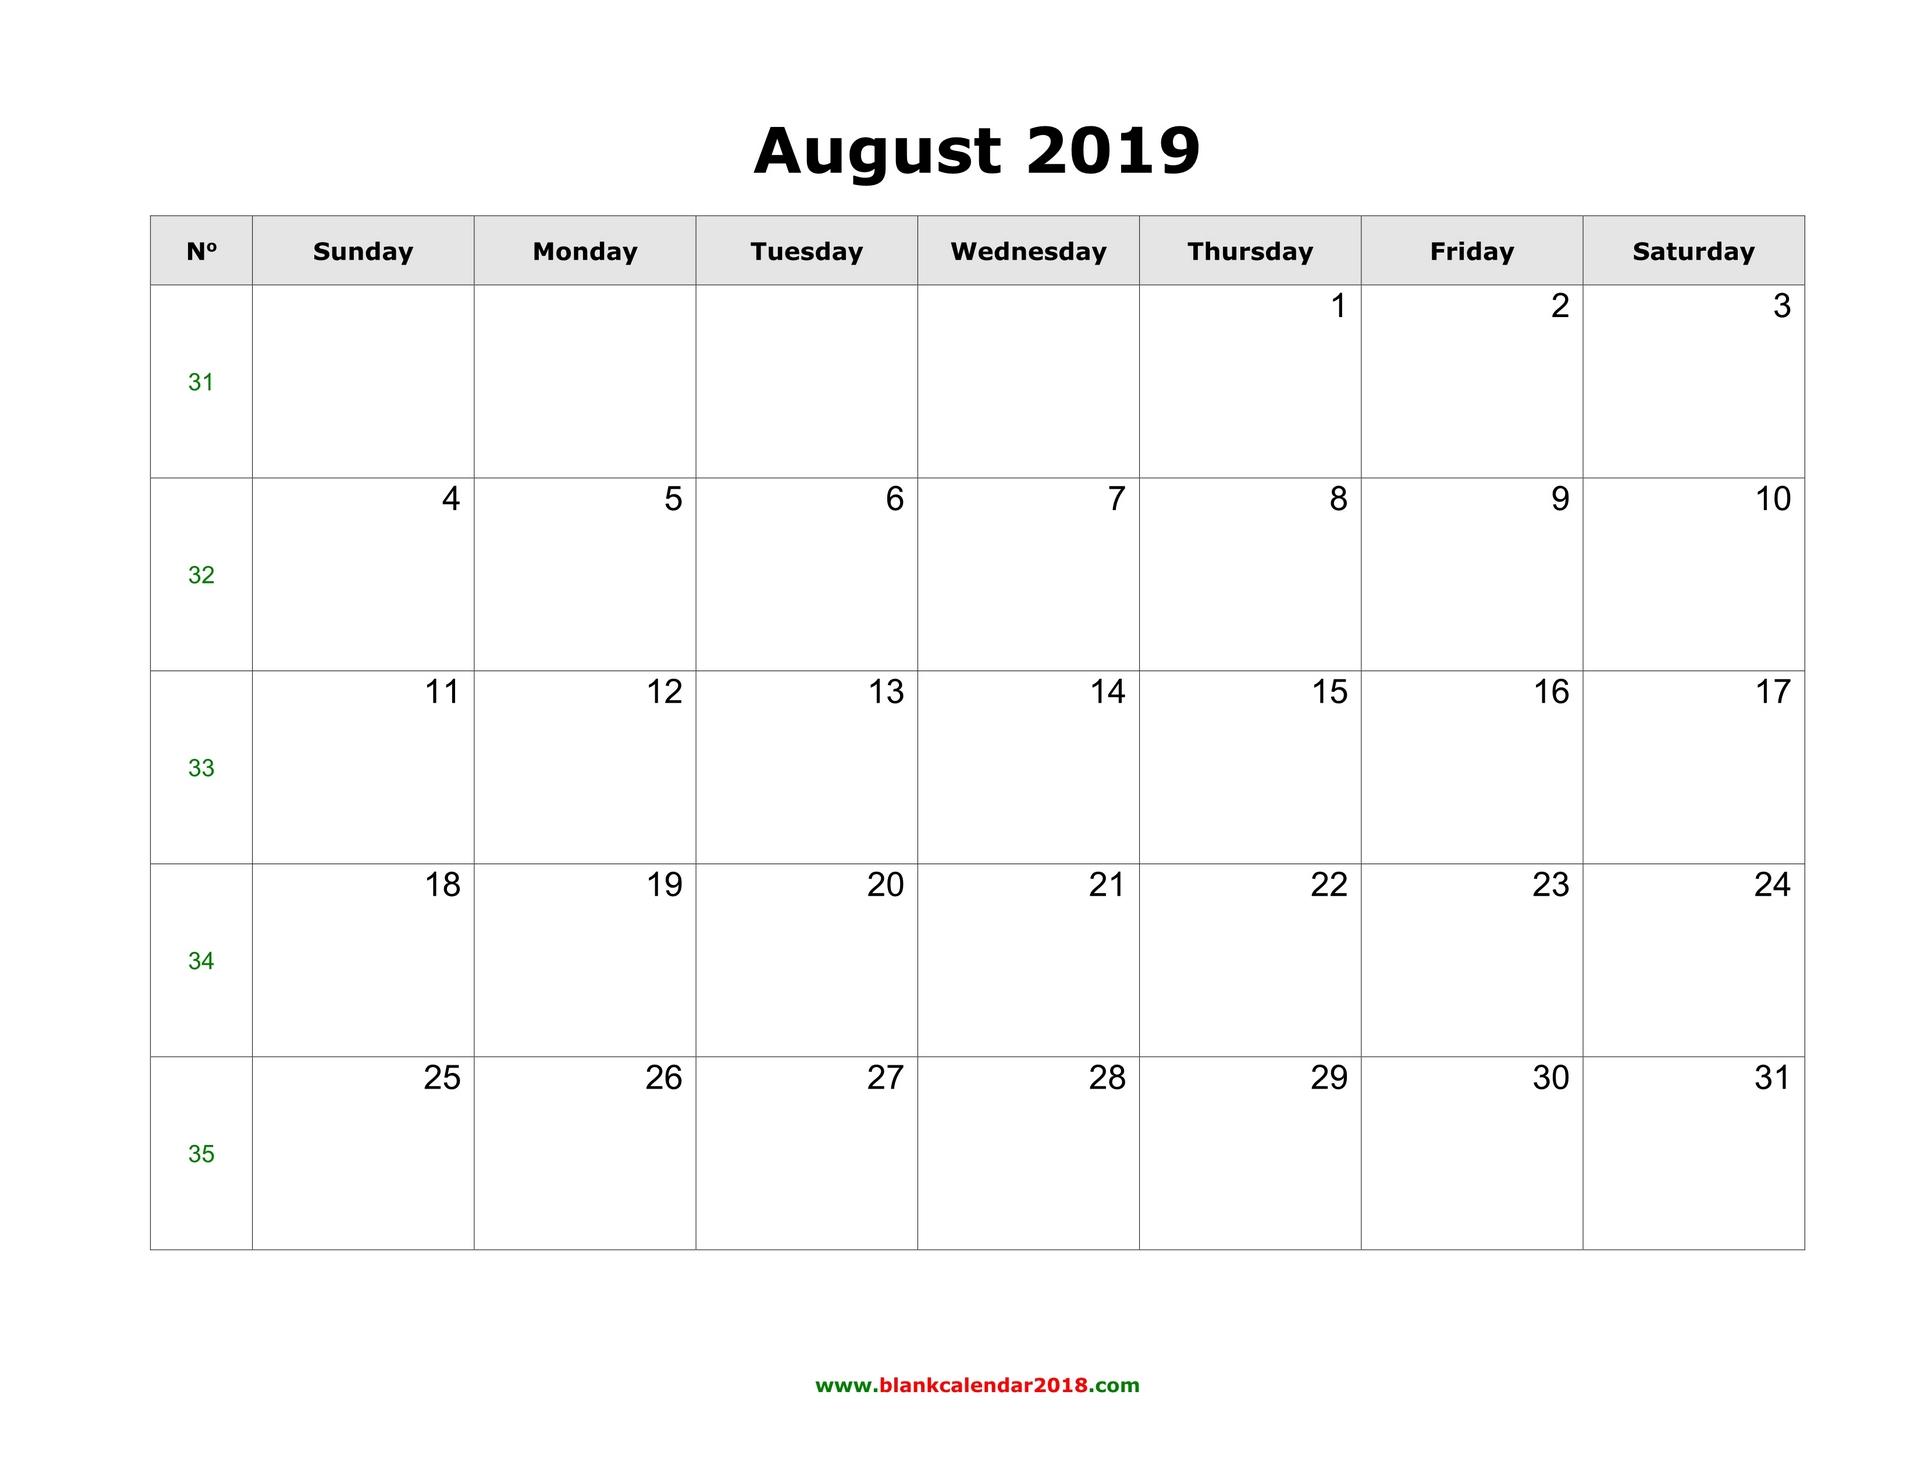 Blank Calendar For August 2019 pertaining to Blank Calendar Printable August